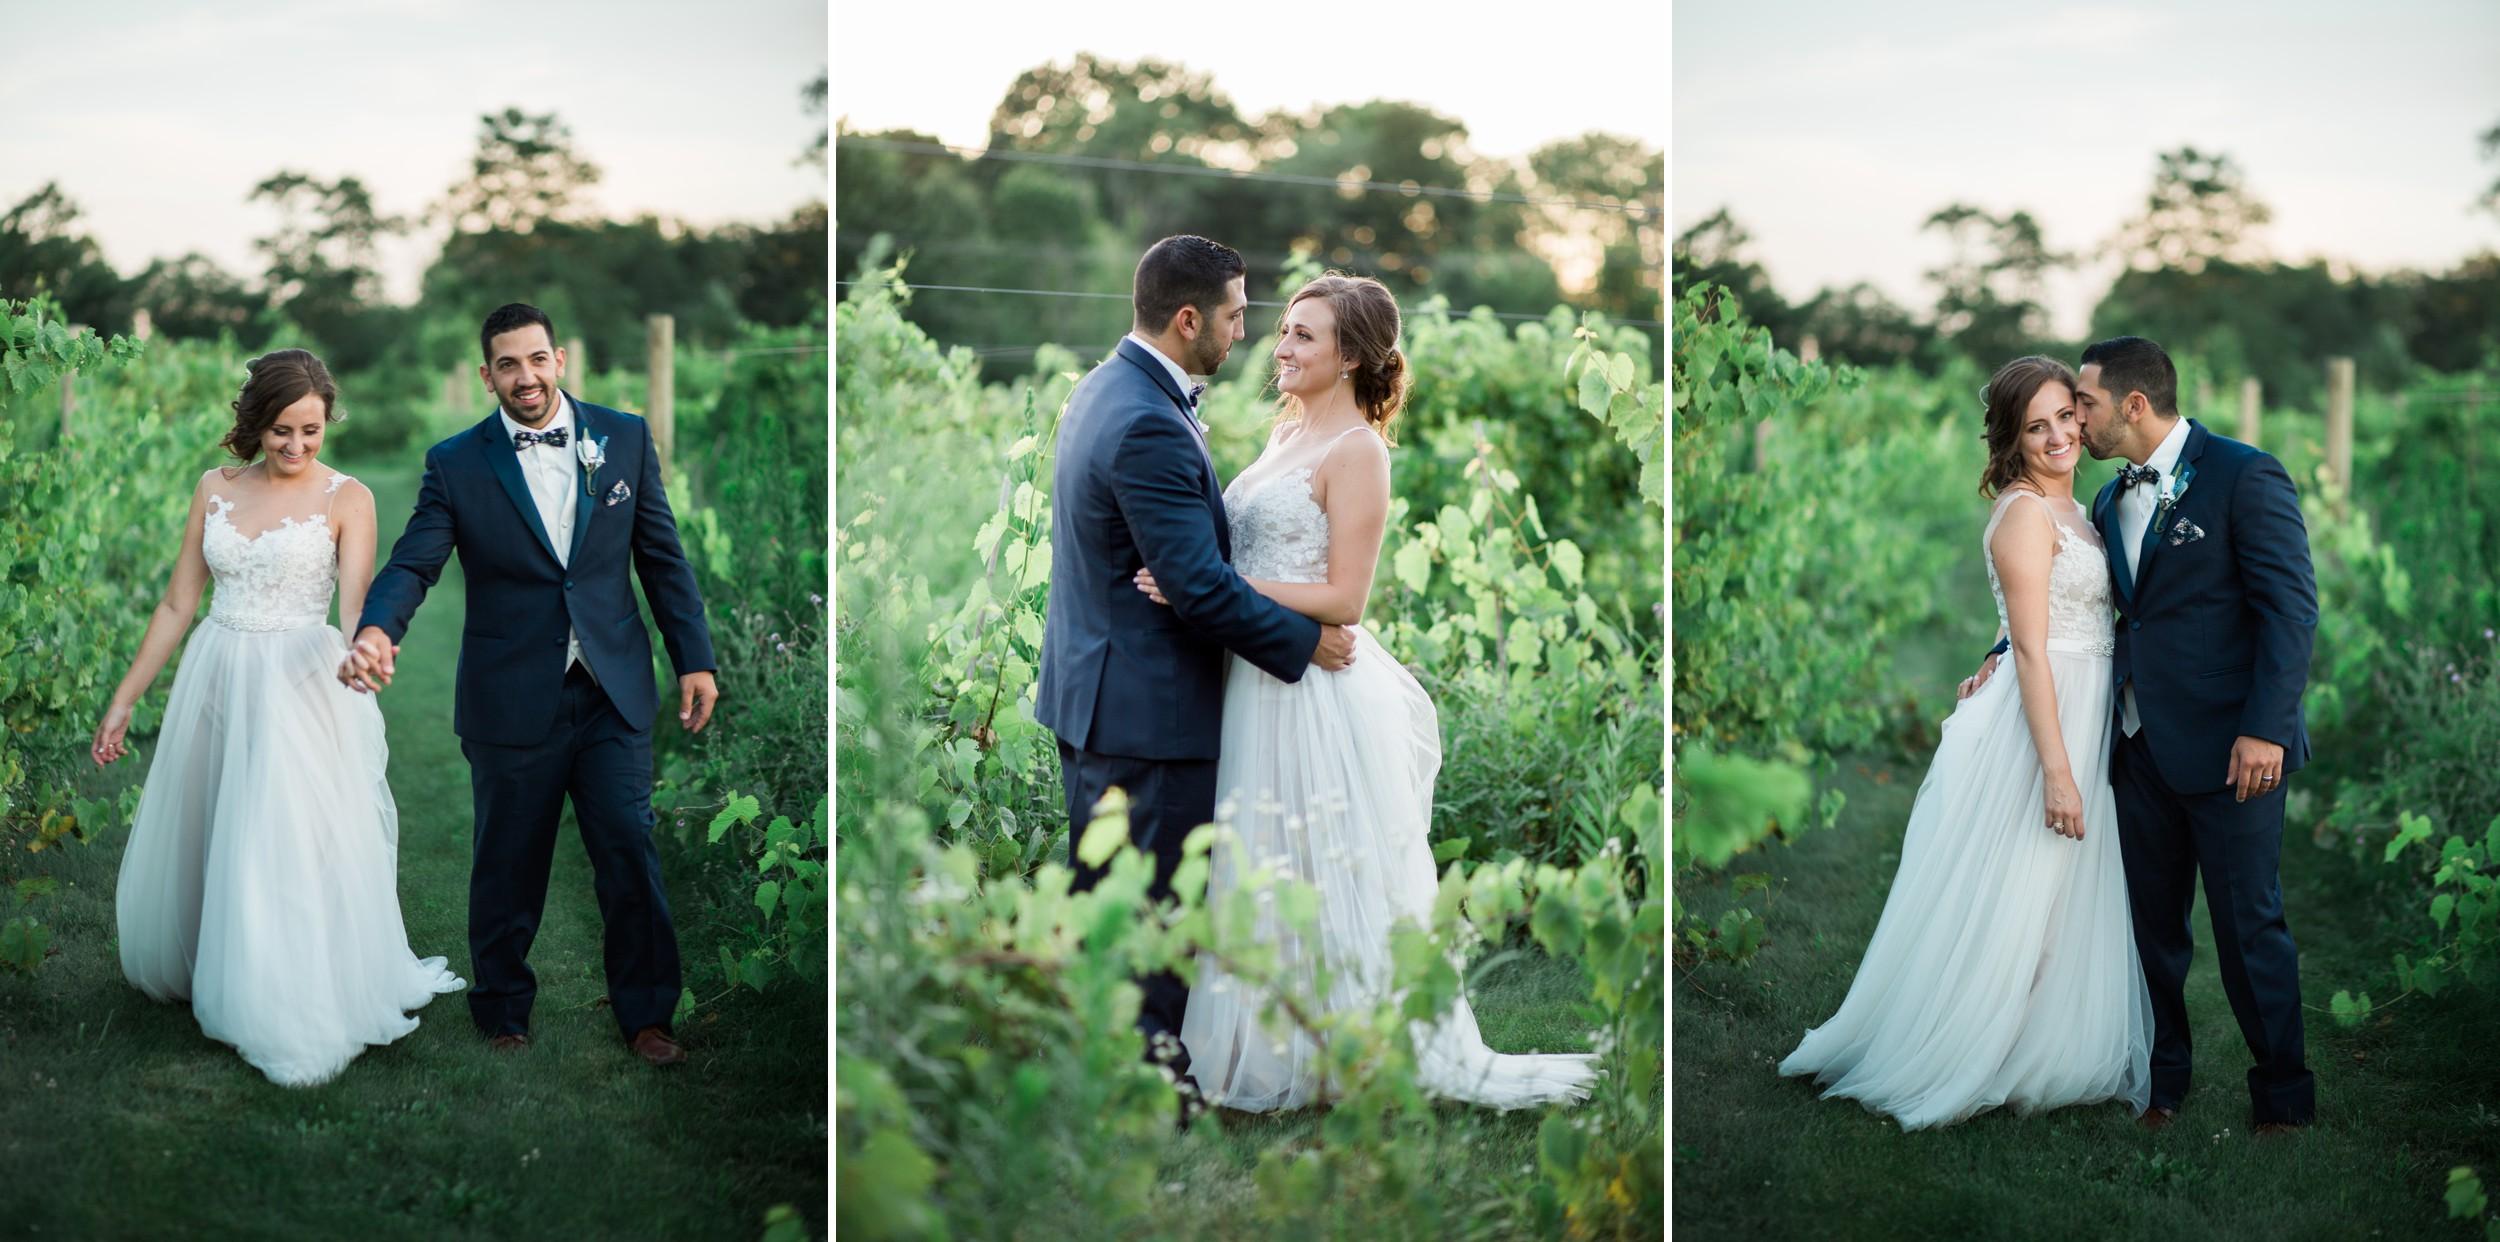 Nick-and-martina-pinelake-vinyards-wedding-columbiana-ohio-tracylynn-photography 17.jpg